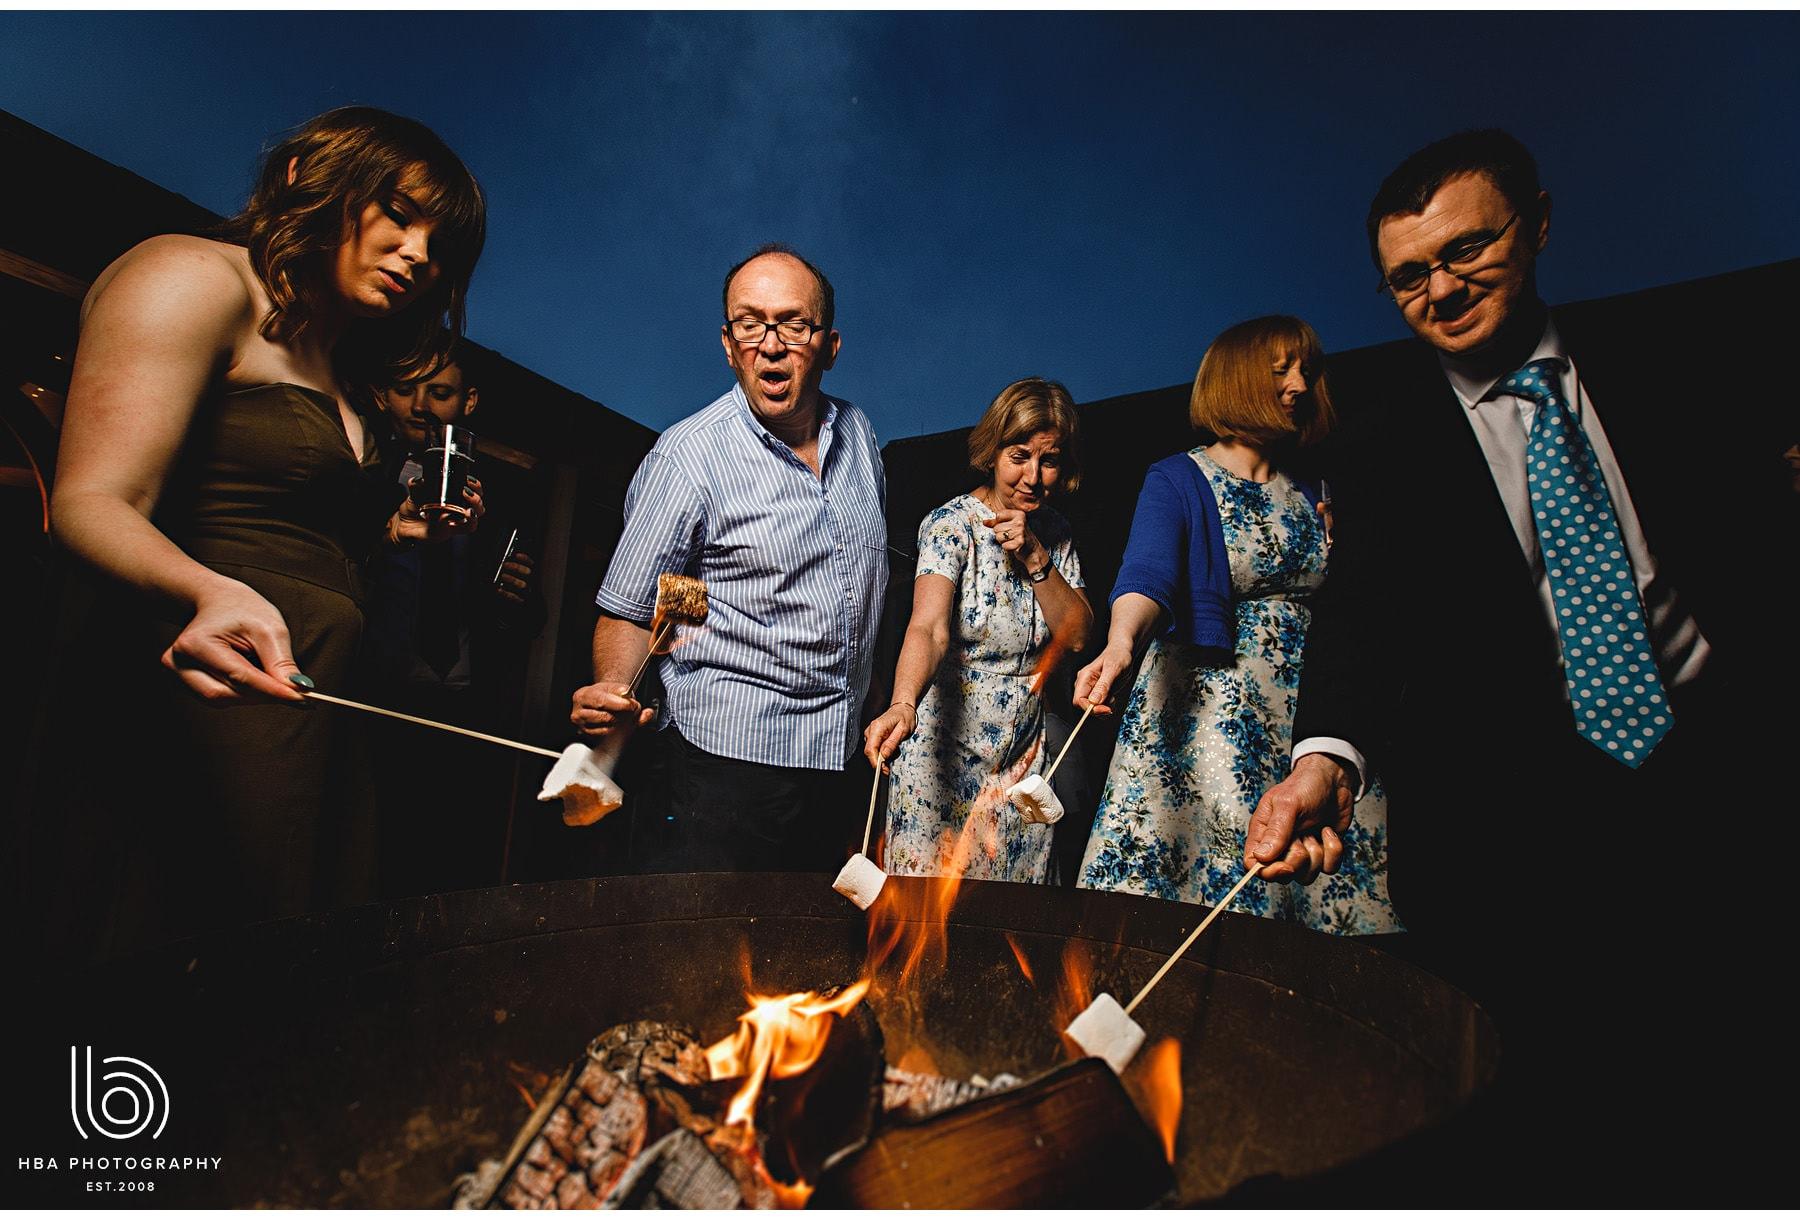 wedding guests roasting marshmallows